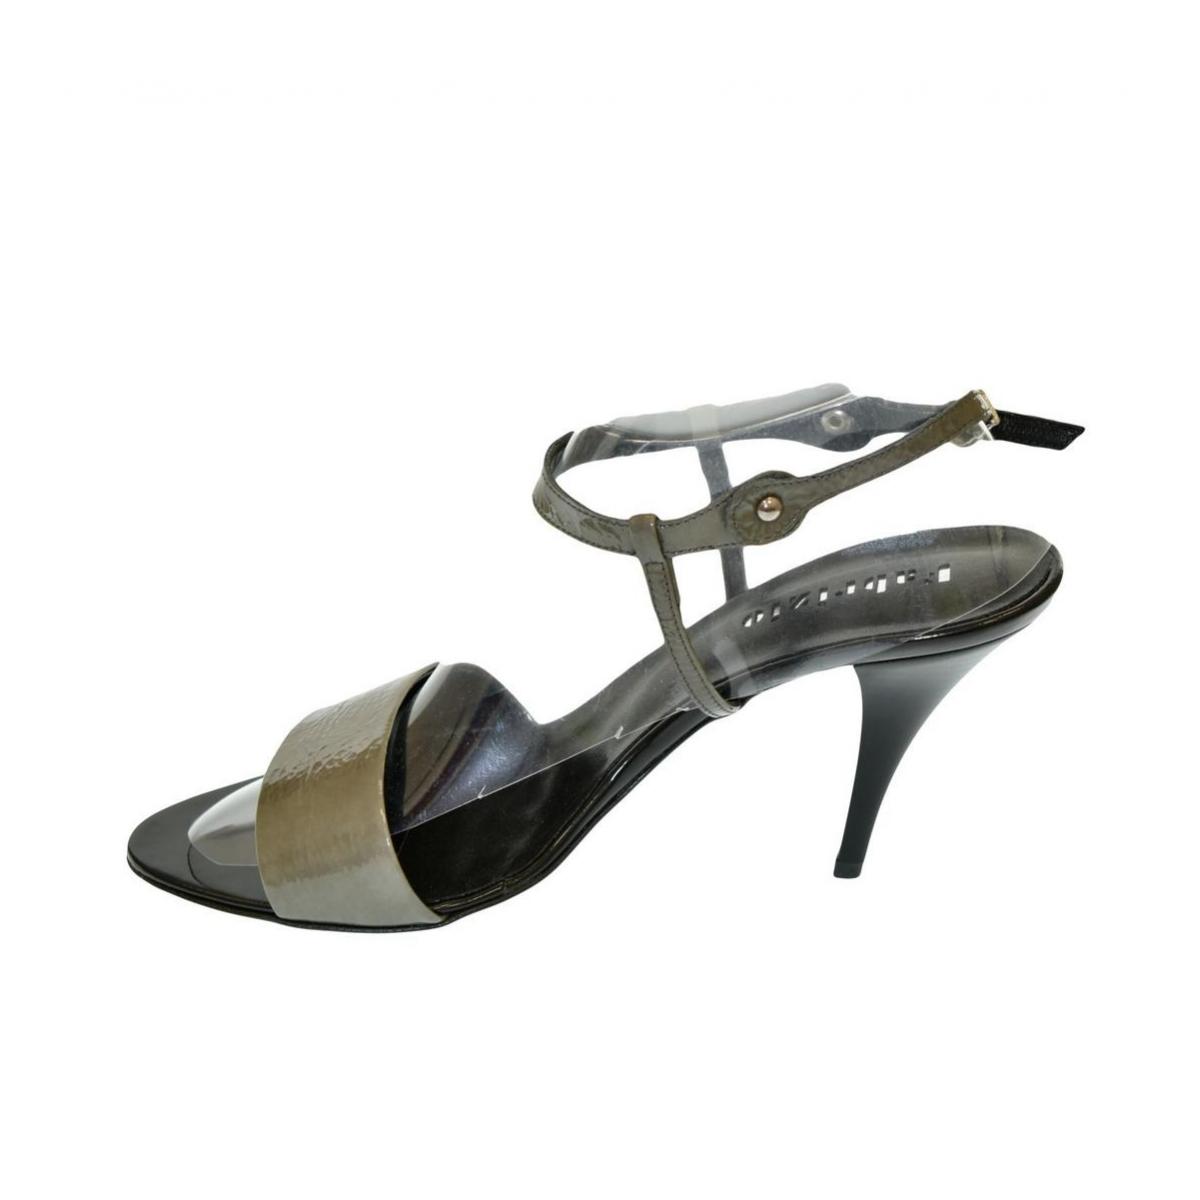 f4ecb3d924f6 Dámske sivé sandále THALIA - 3